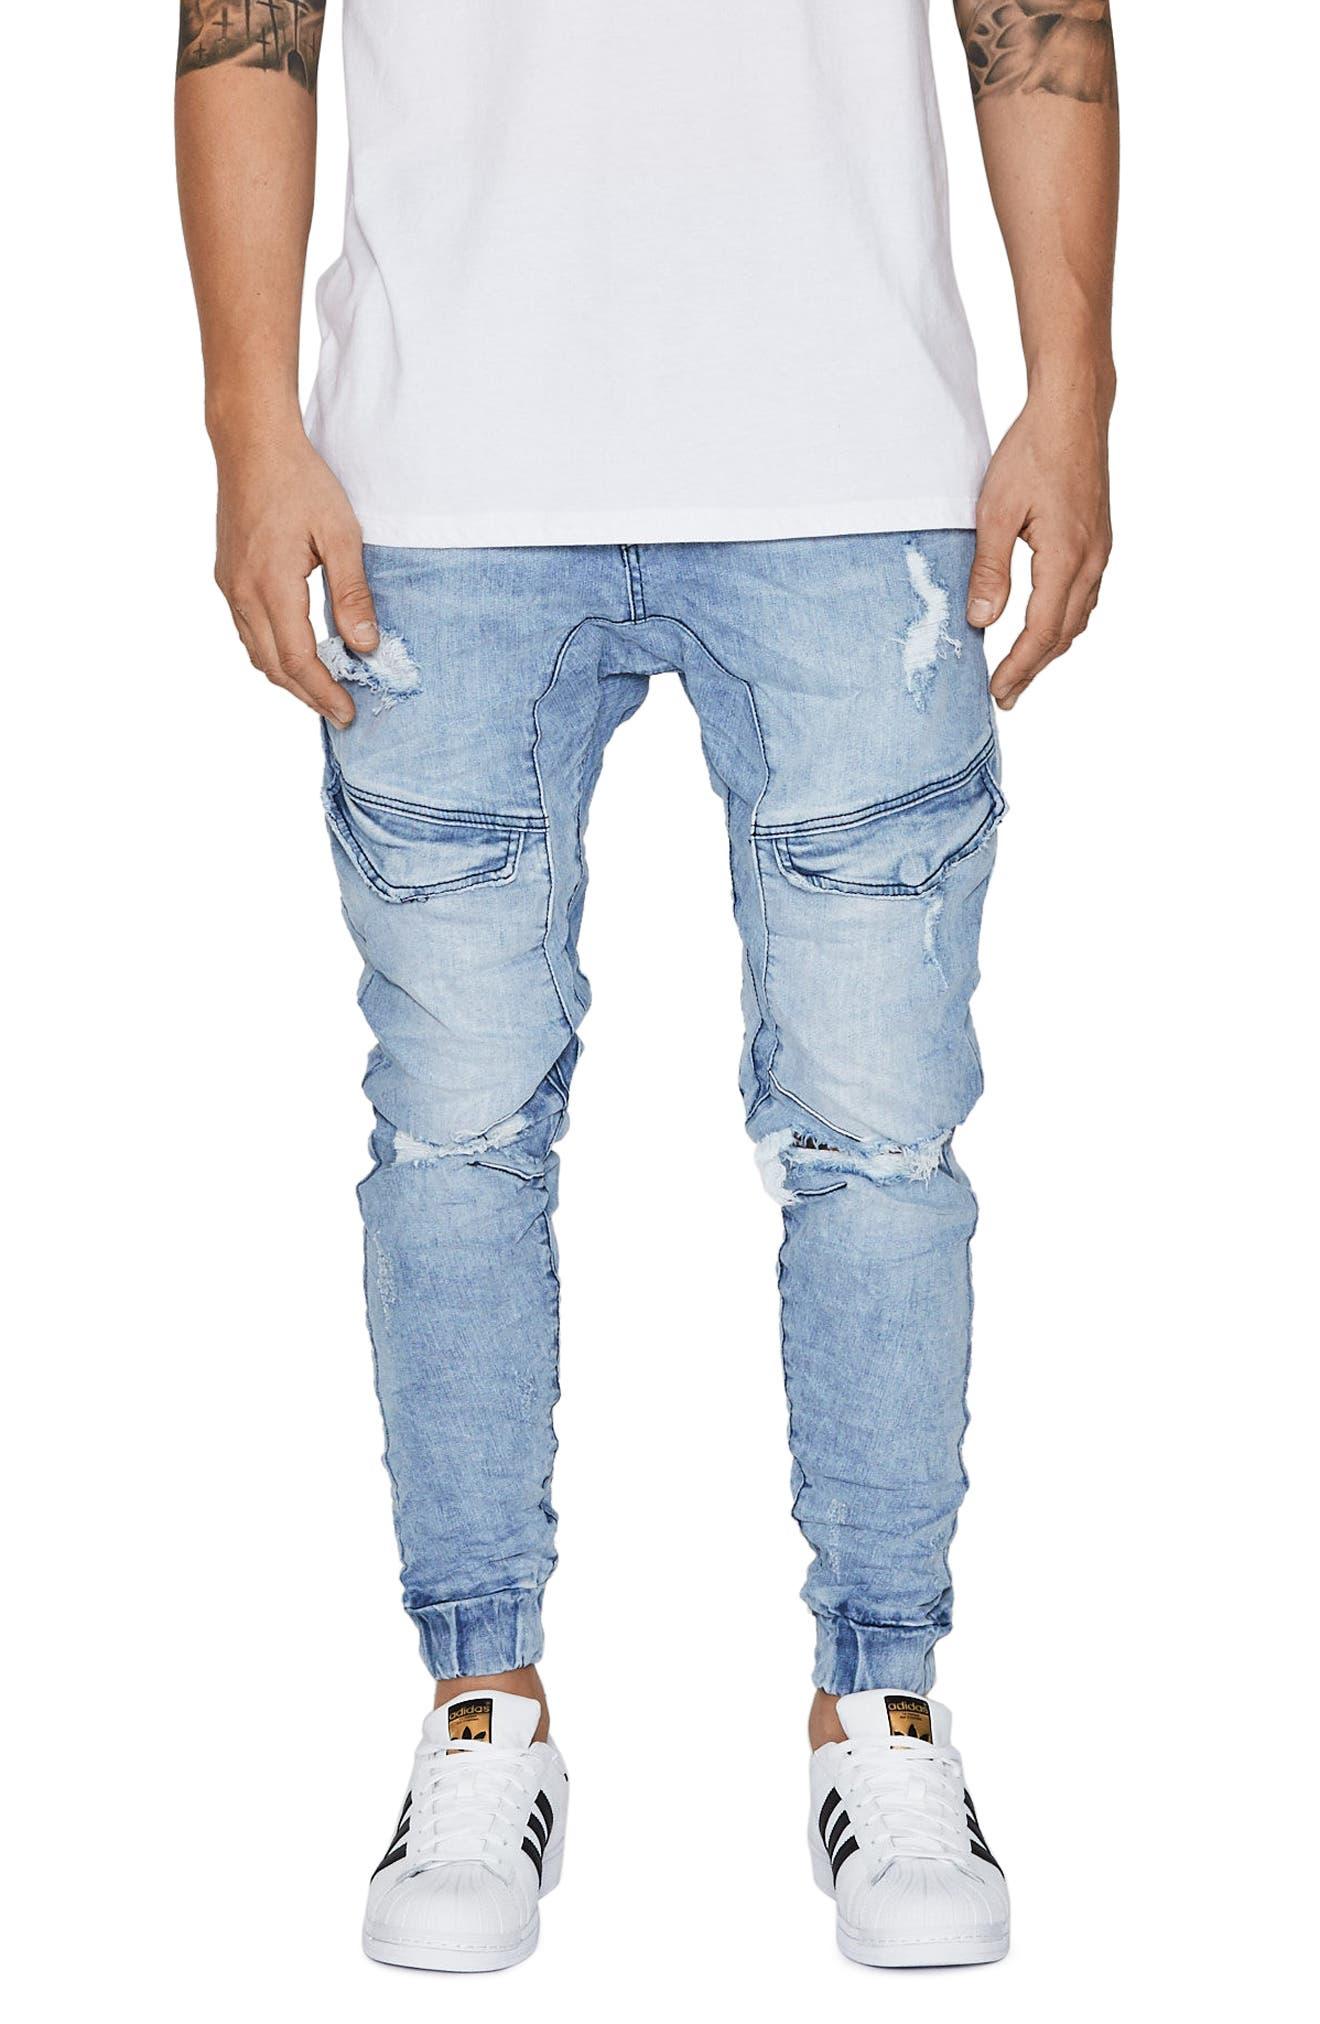 Flight Skinny Denim Jogger Pants,                         Main,                         color, Broken Blue